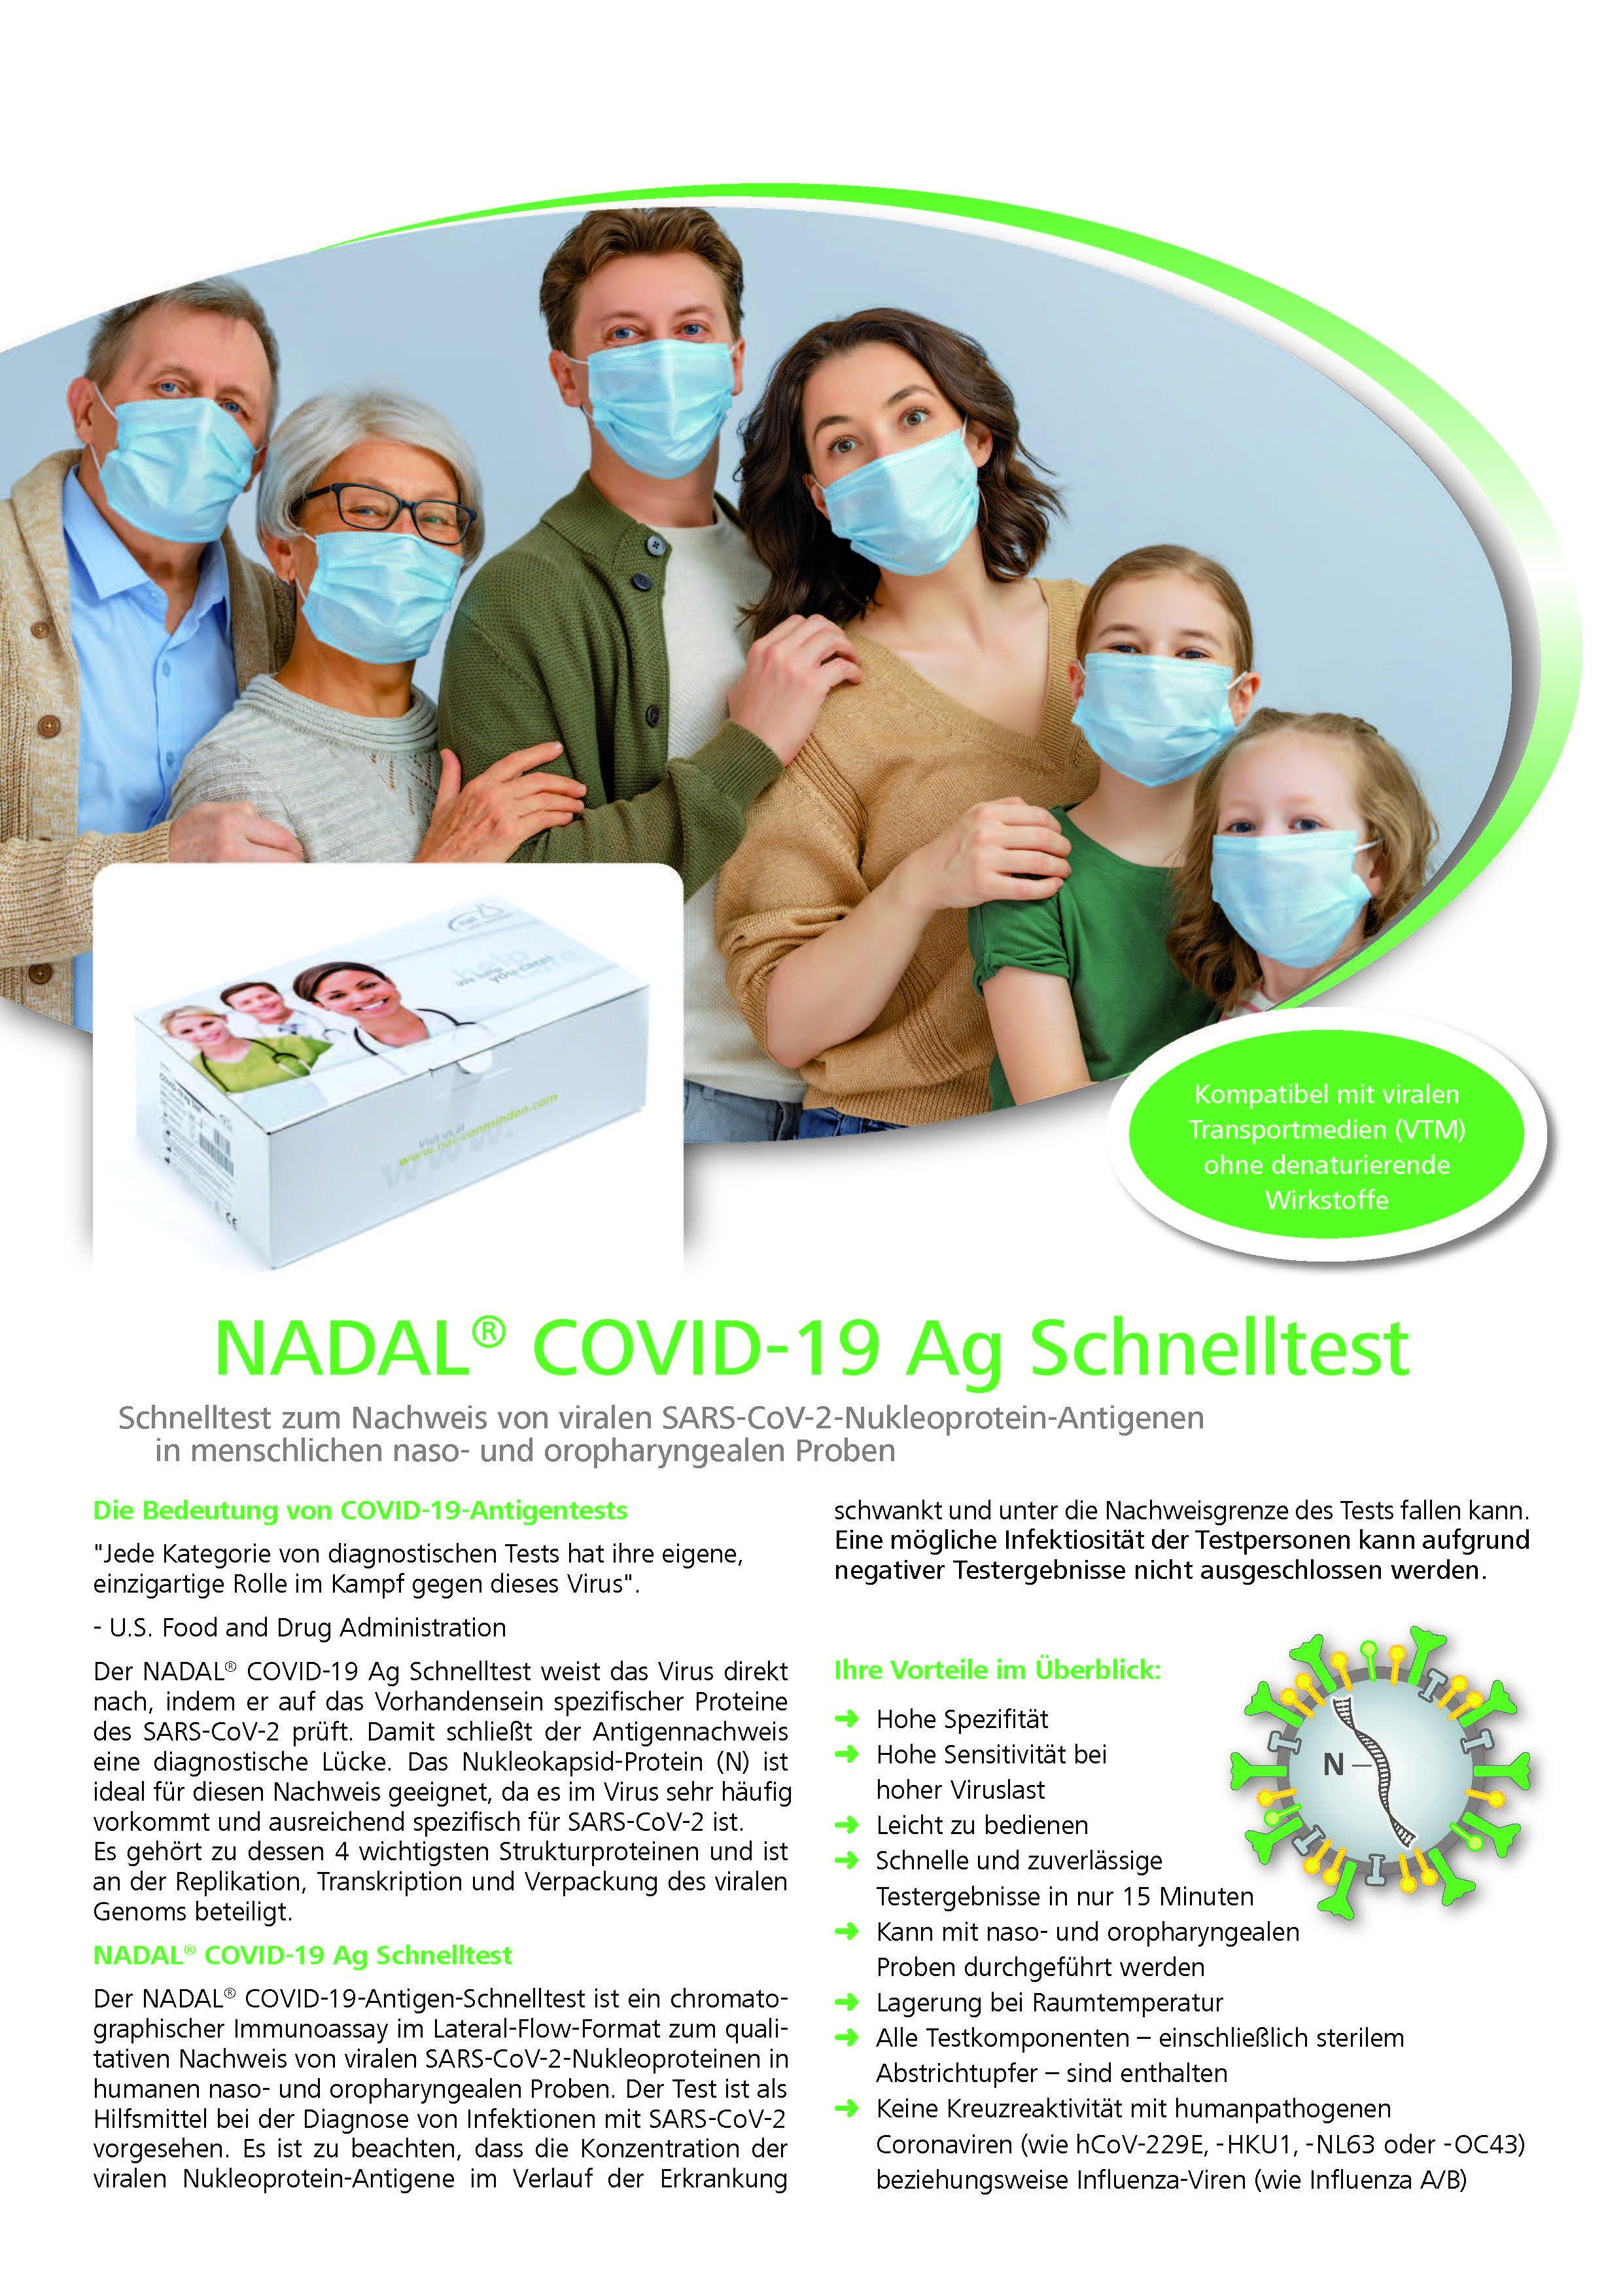 NADAL® COVID-19 ANTIGENTEST nur an medizinisches Fachpersonal